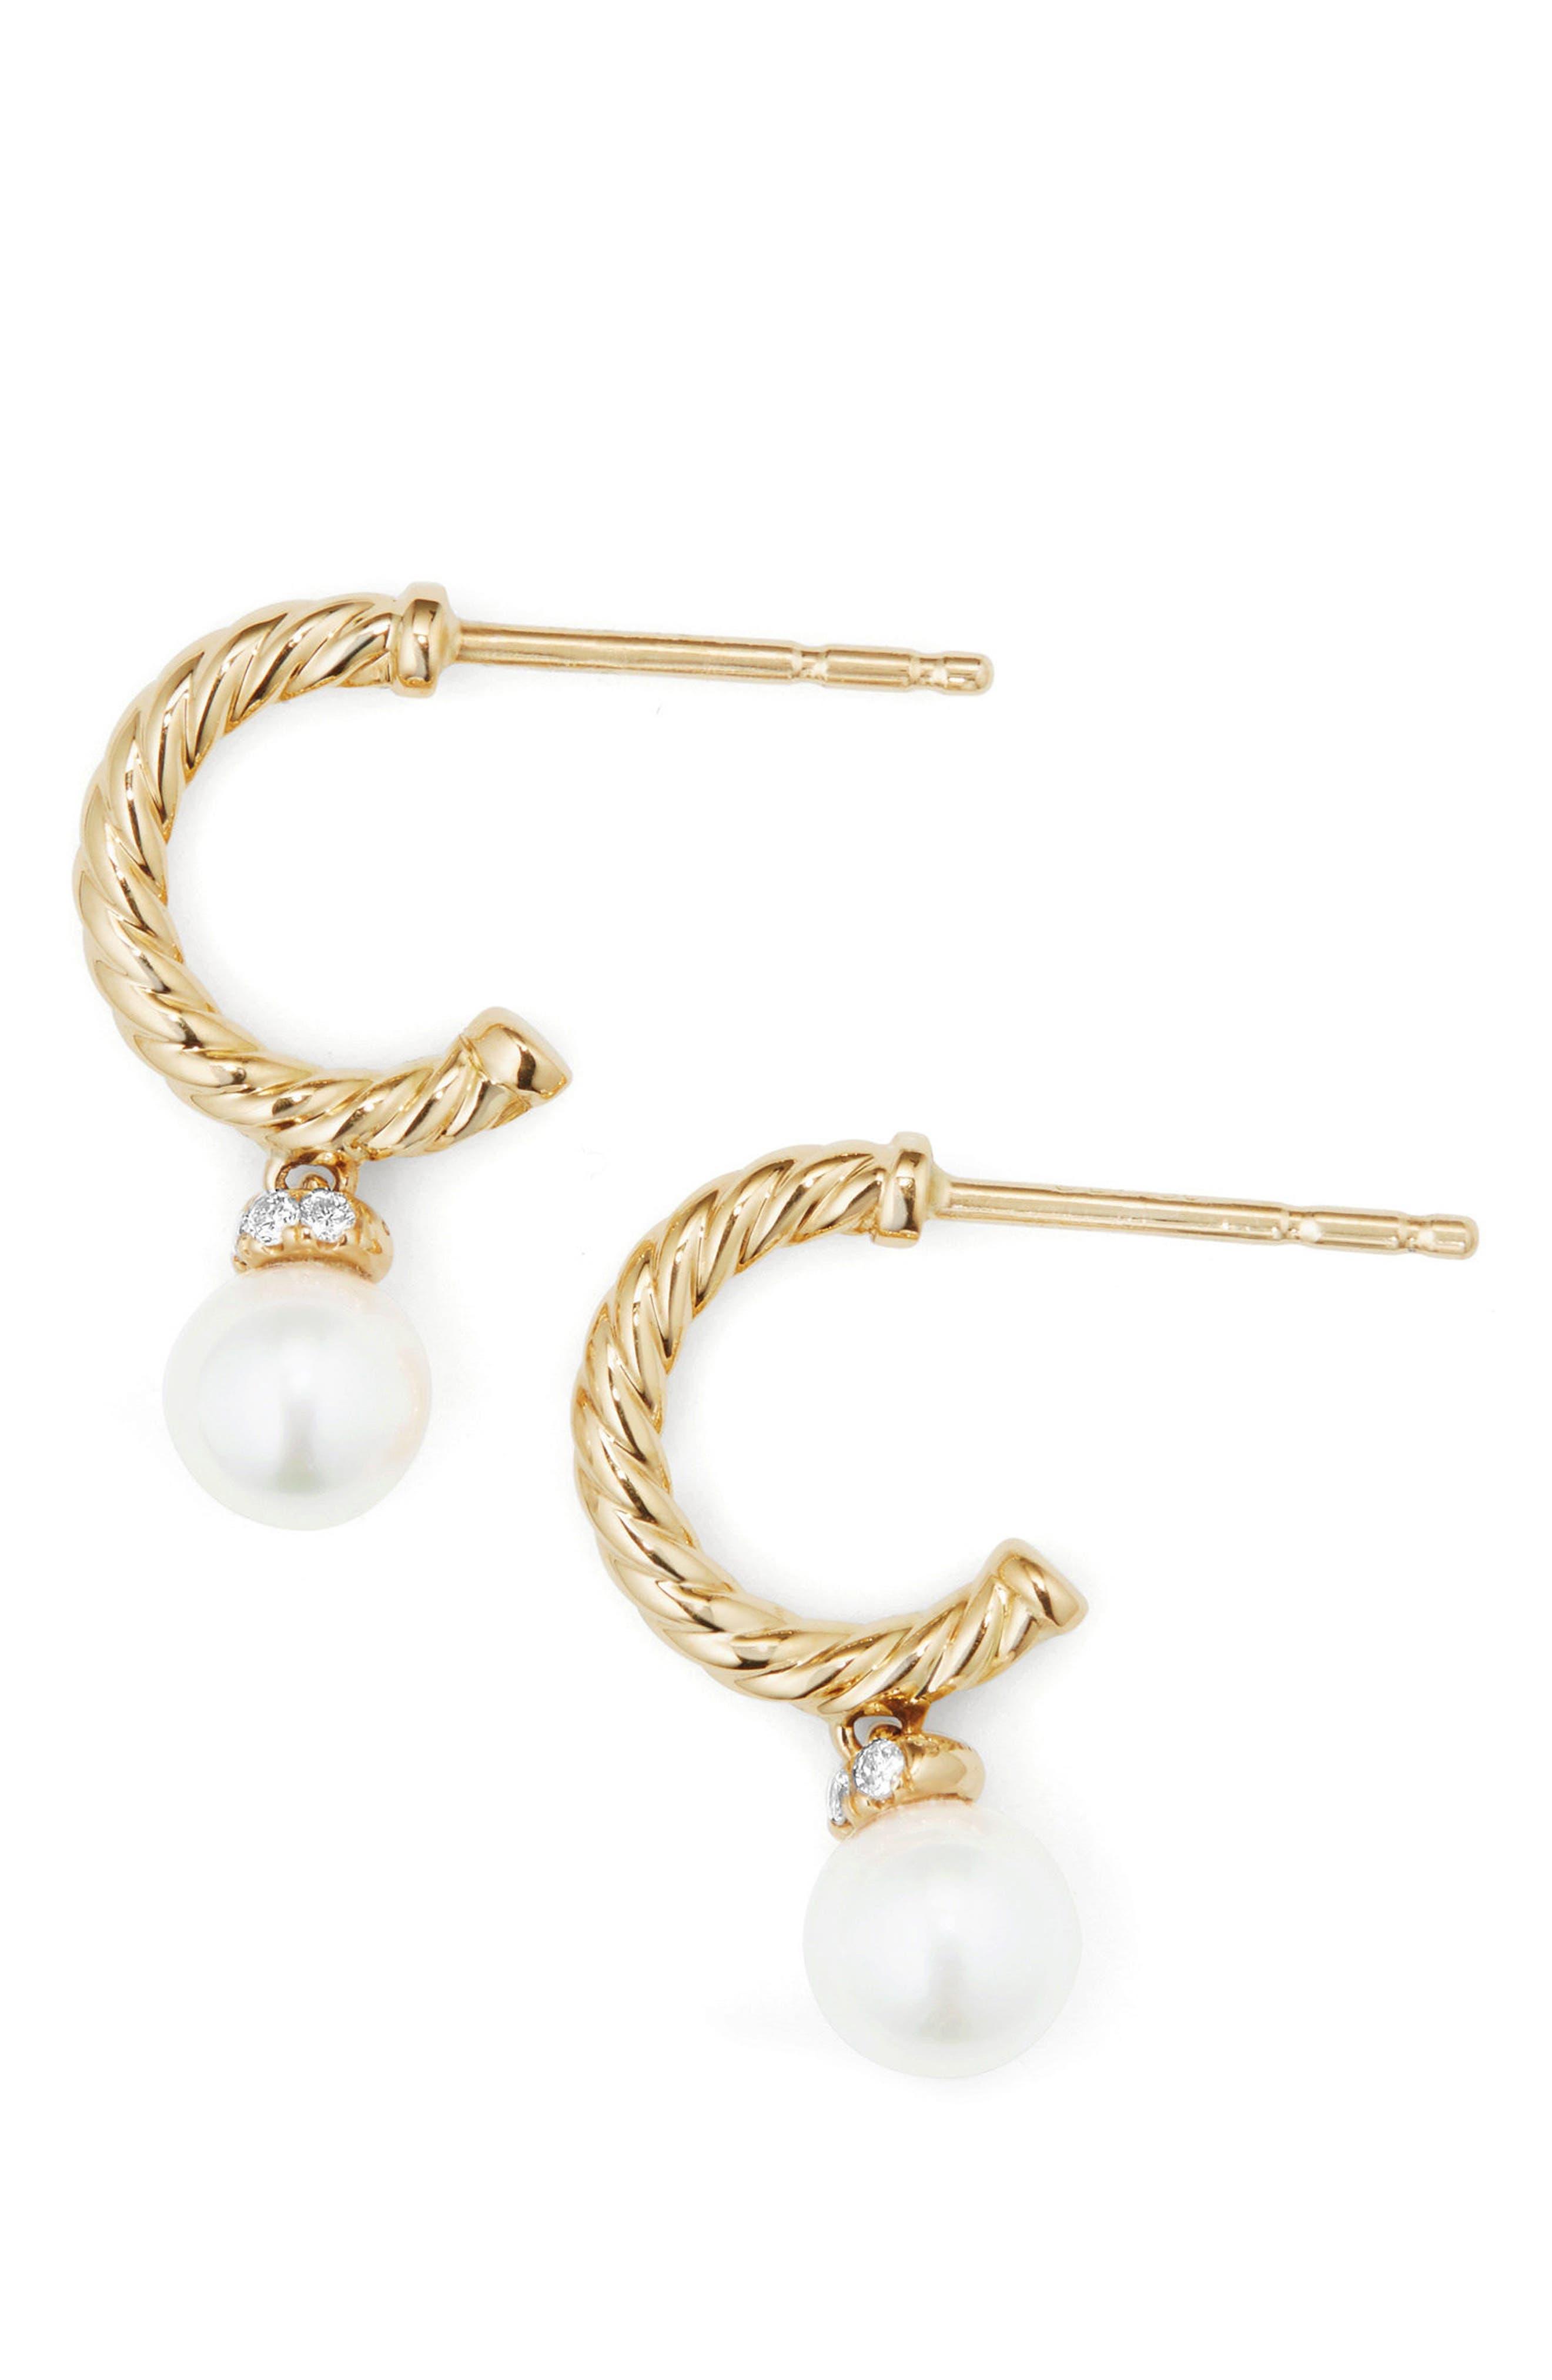 Solari Hoop Earrings with Diamonds & Pearls in 18K Gold,                             Main thumbnail 1, color,                             YELLOW GOLD/ DIAMOND/ PEARL